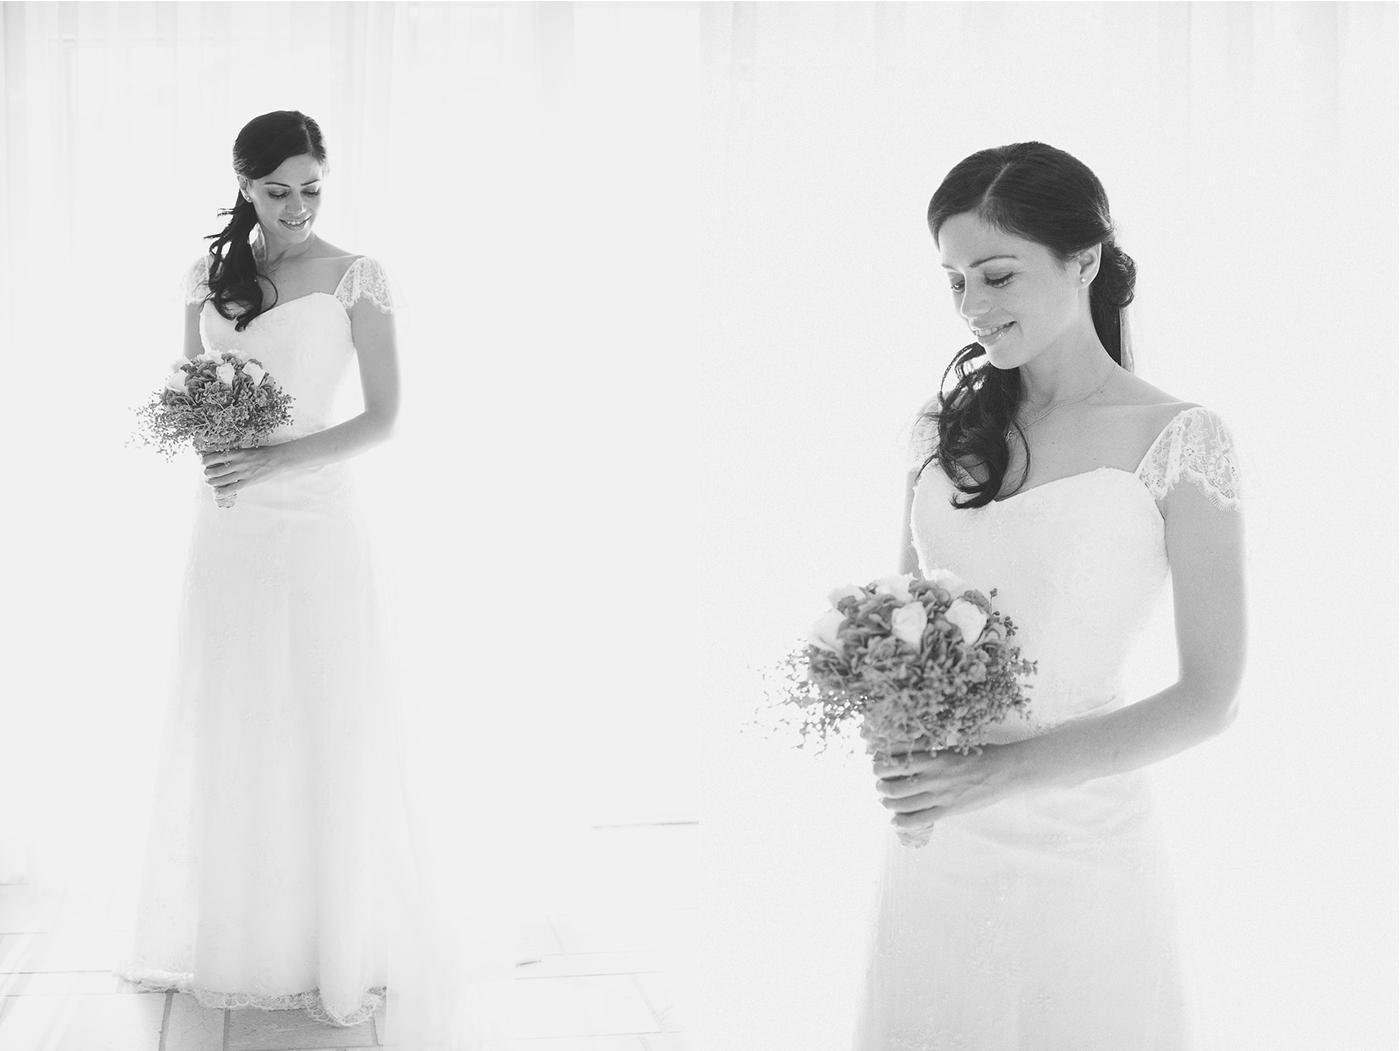 Bodrum-Weddings-Raphael-Perim-7